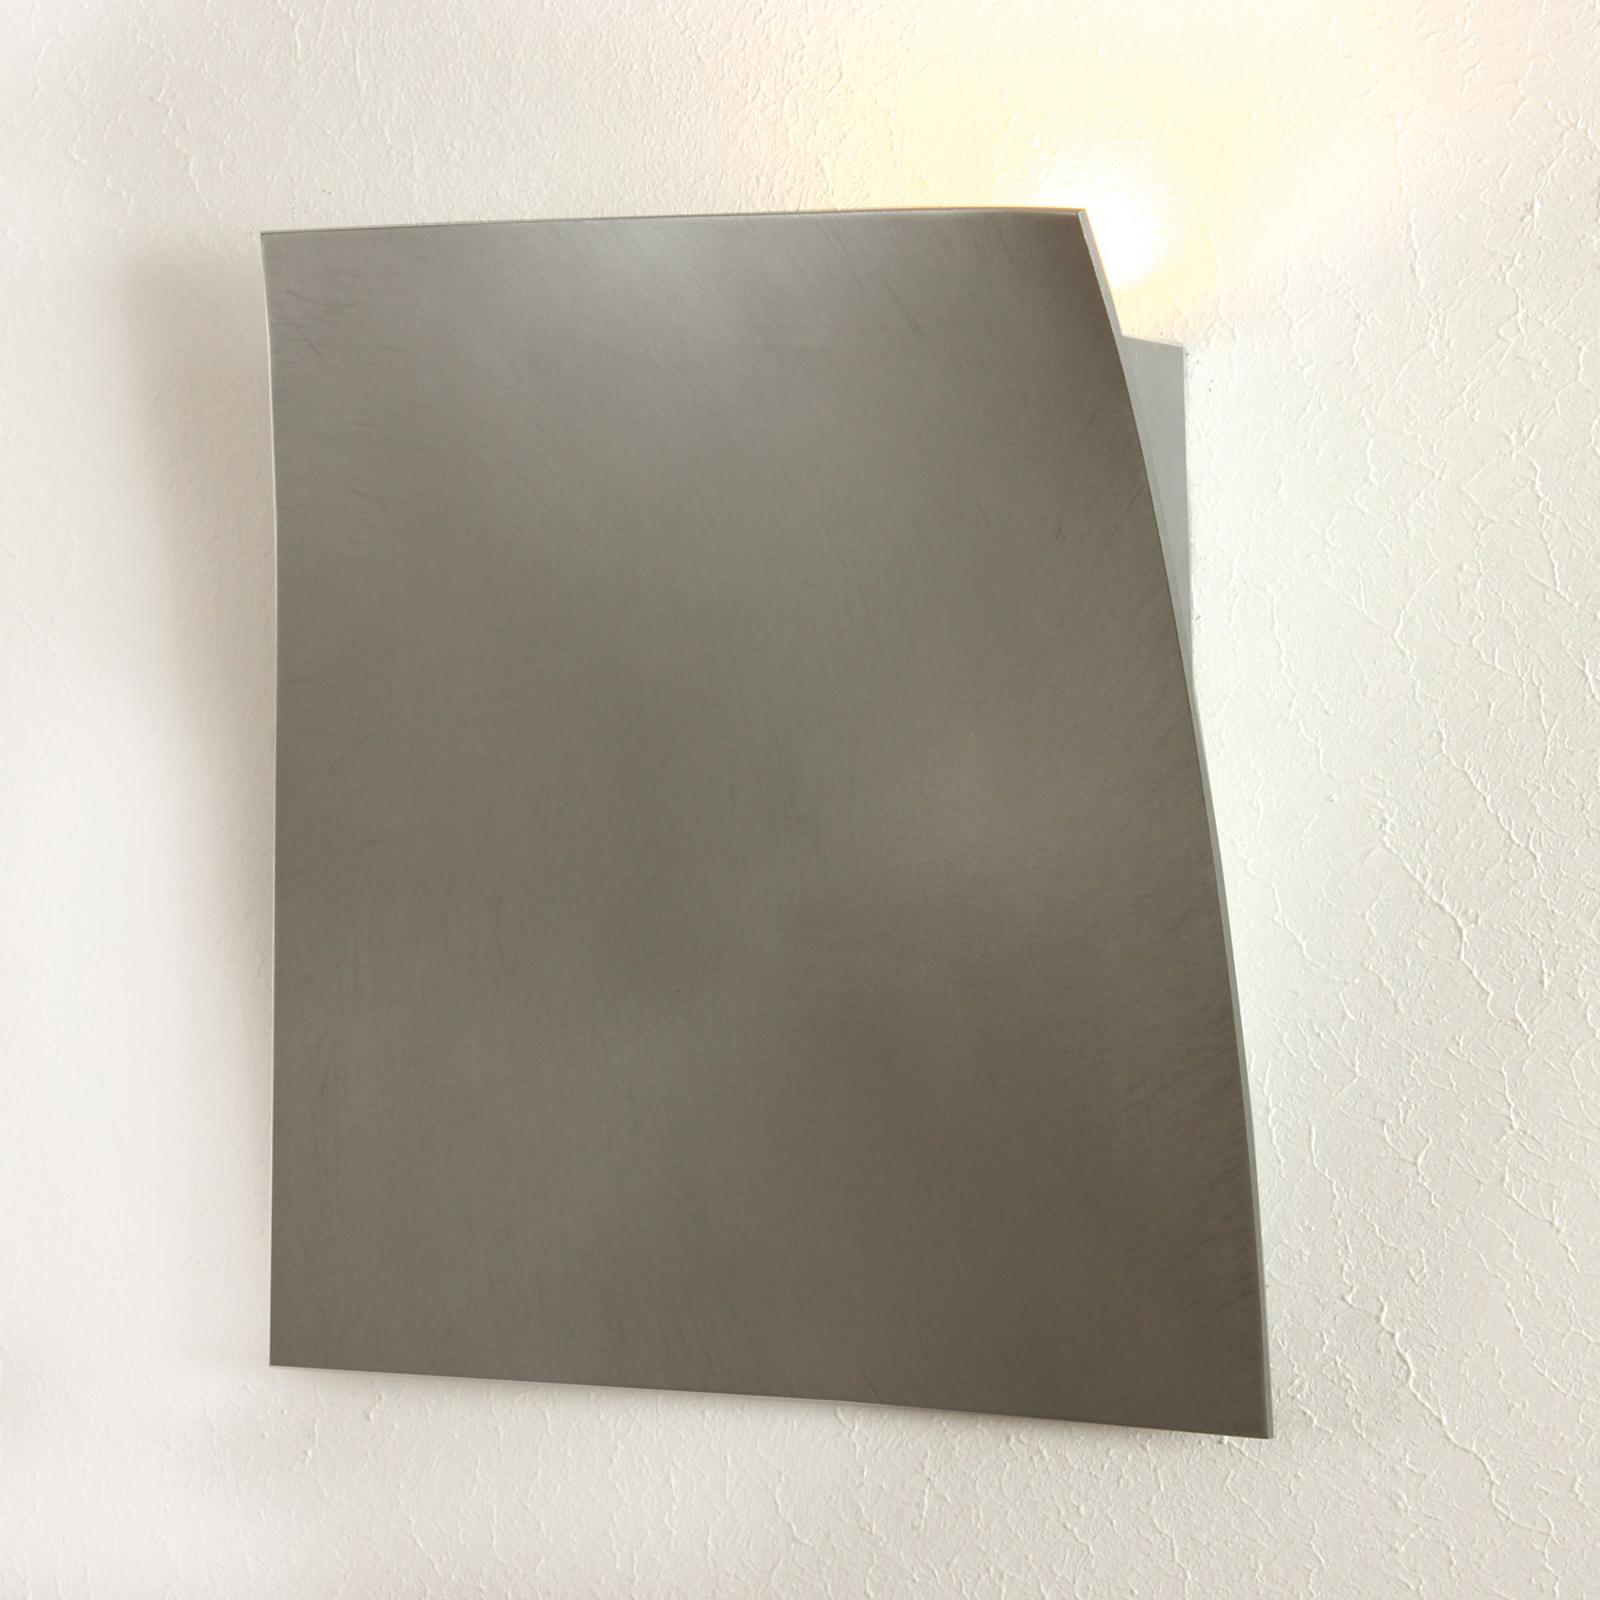 Applique LED Gap in alluminio levigato